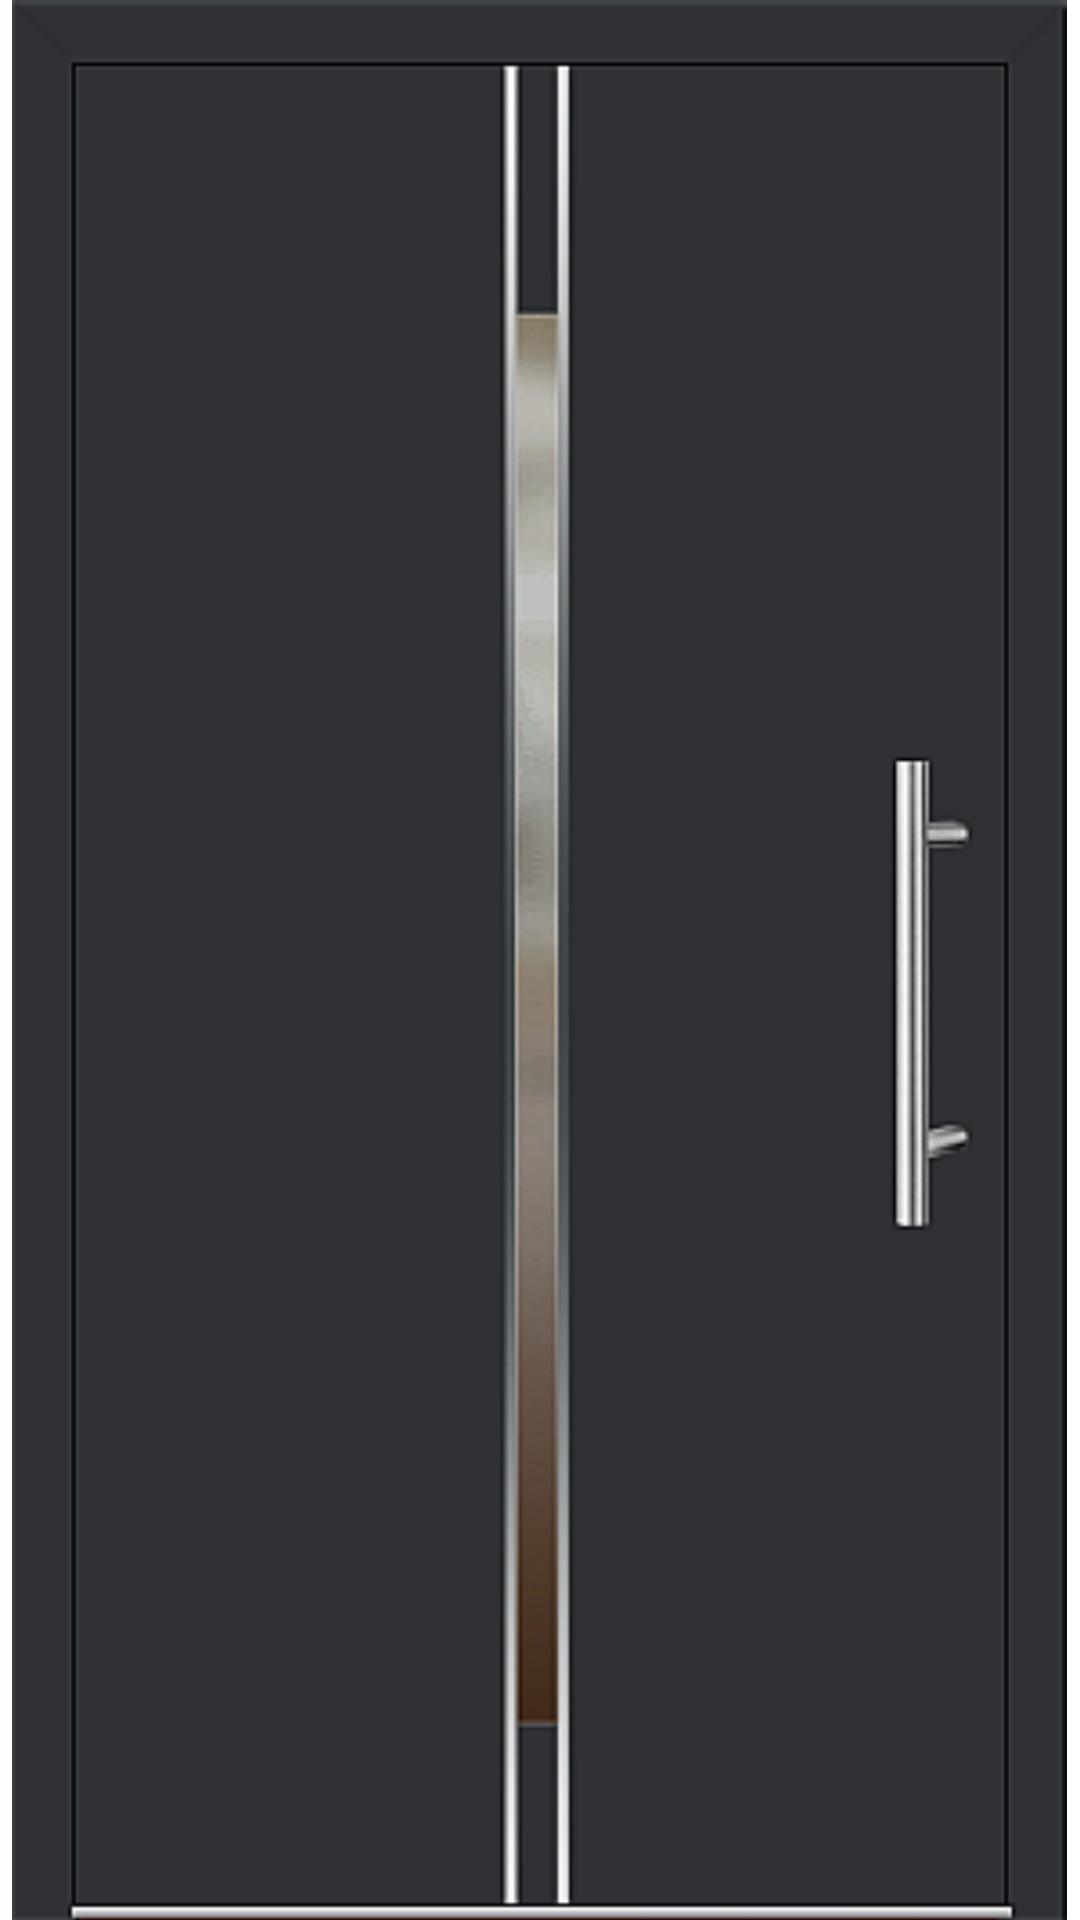 Aluminium Haustür Modell 6864-53 schwarz